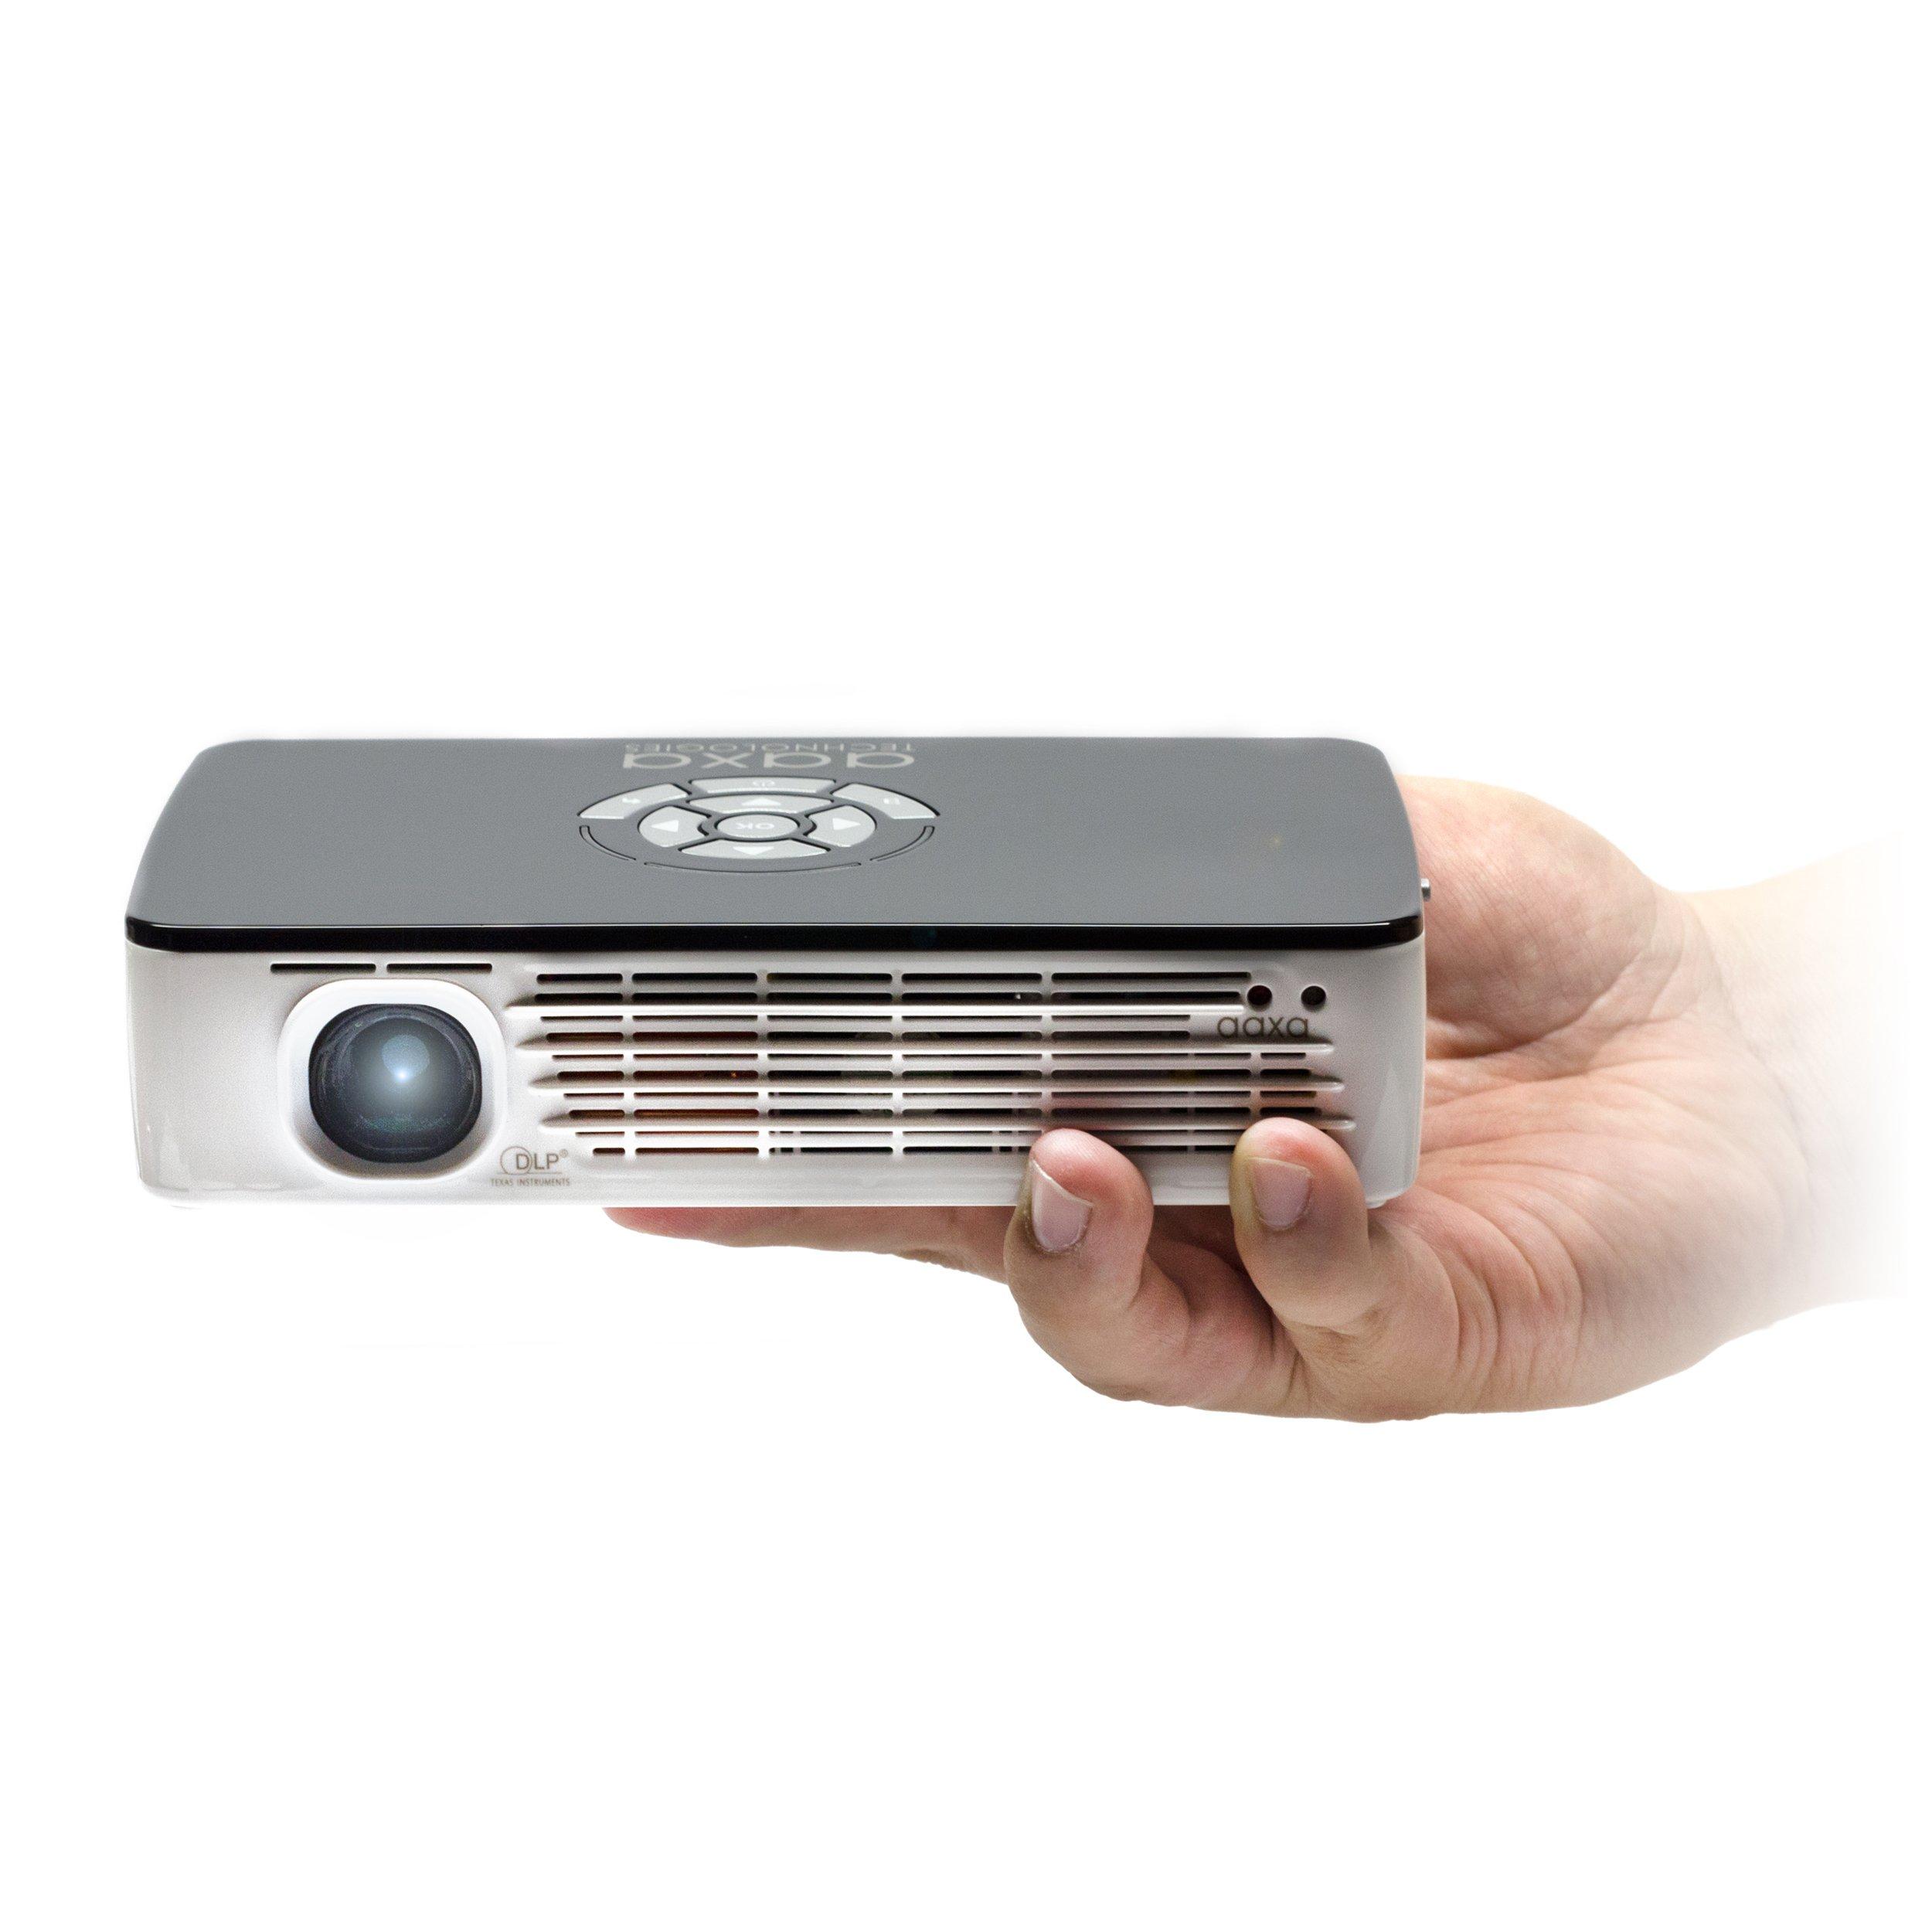 AAXA KP-700-01 P700 WXGA LED Pico Projector, 650 Lumens, 70+ Min Battery, Native 1280x800 HD Resolution, 15,000 Hour LED, HDMI, Media Player, DLP